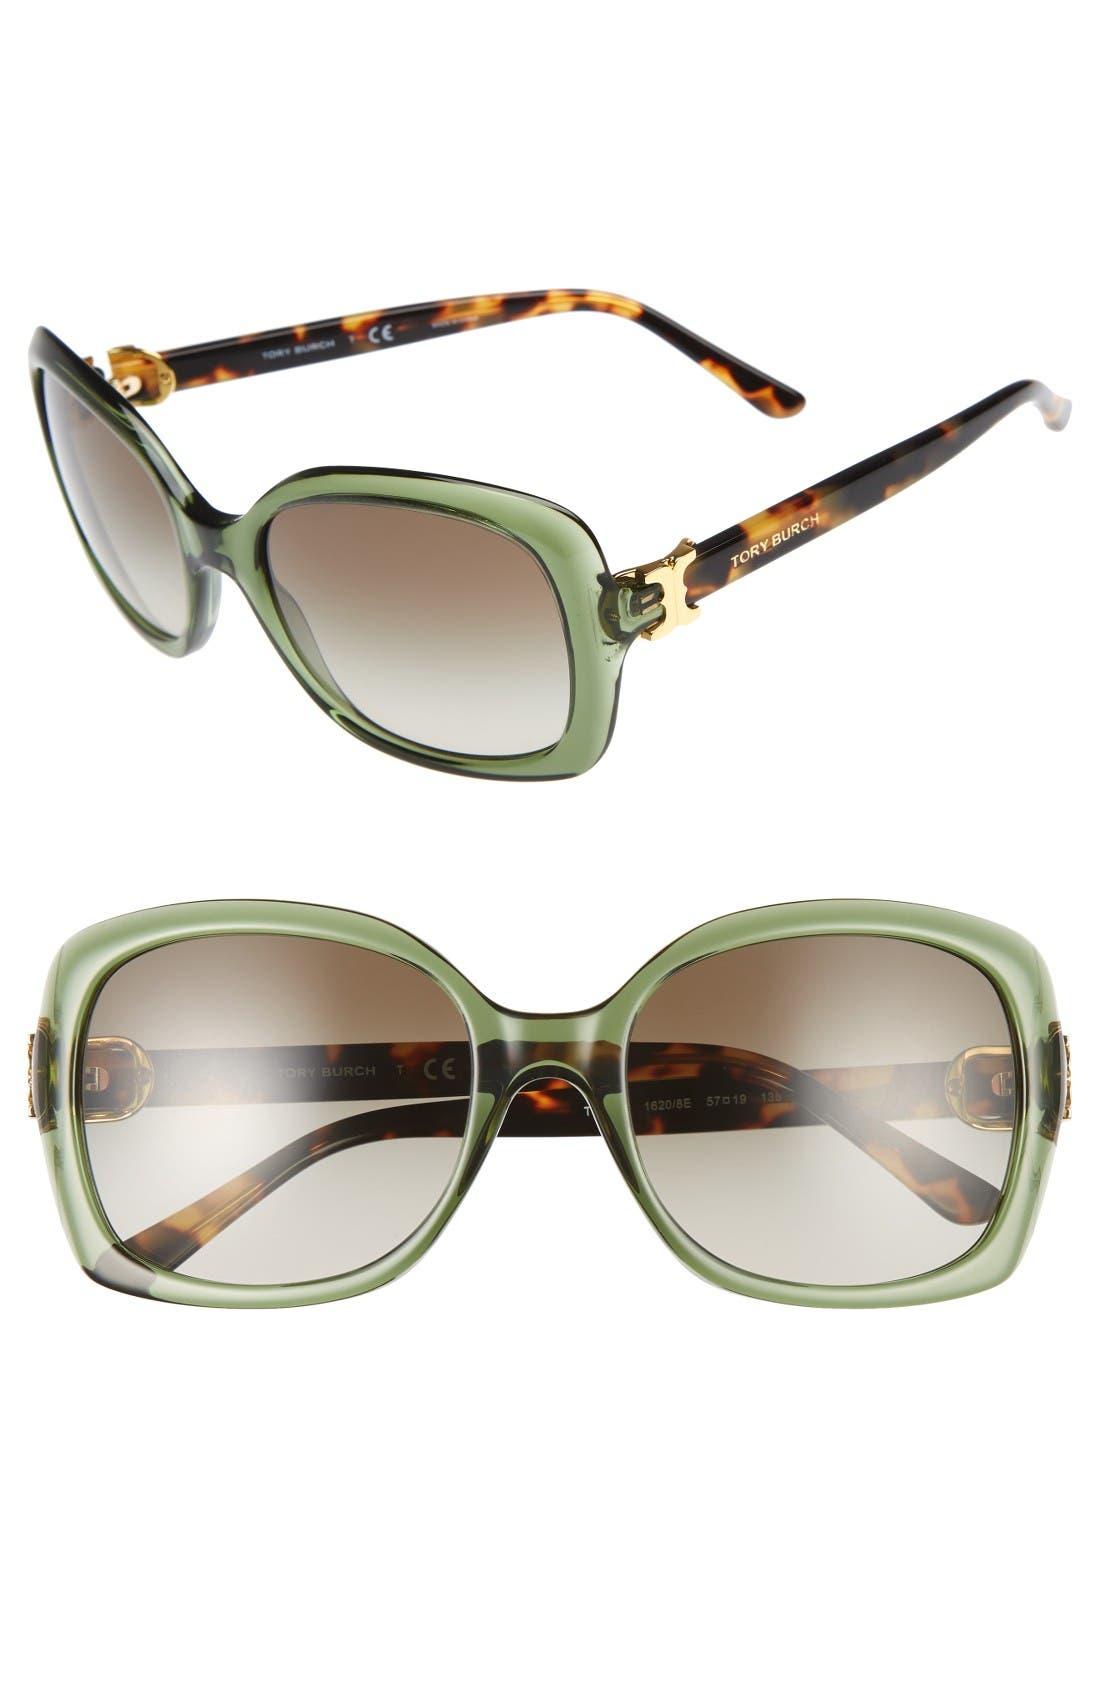 TORY BURCH 57mm Oversized Sunglasses